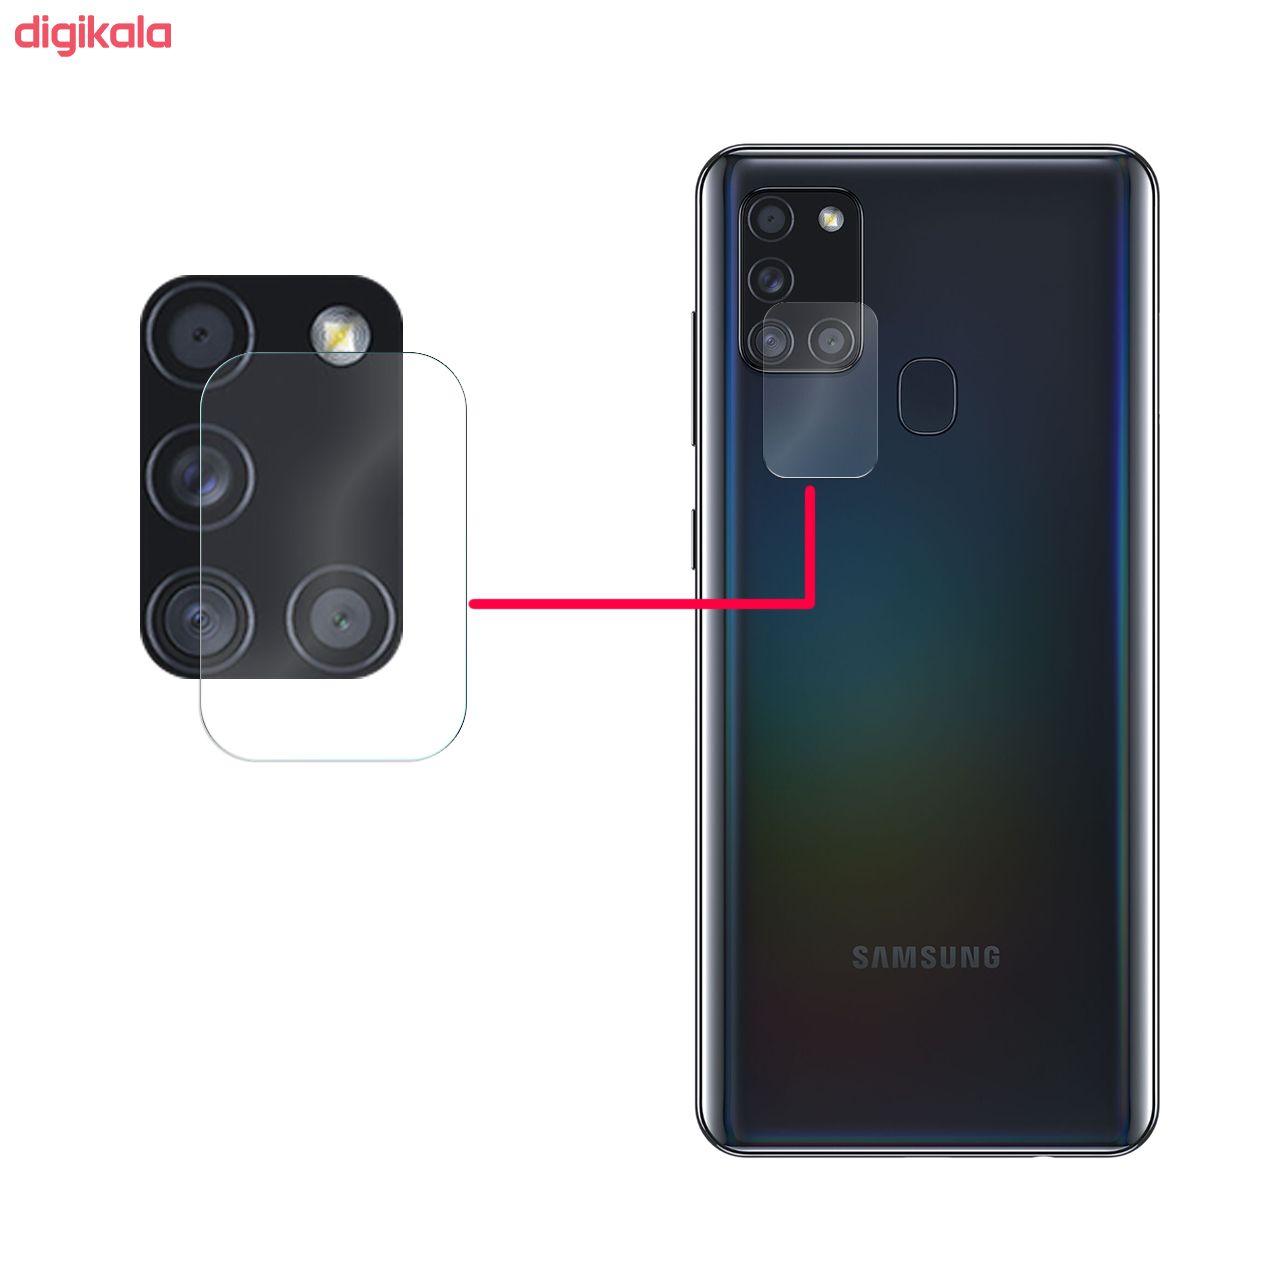 محافظ لنز دوربین سیحان مدل GLP مناسب برای گوشی موبایل سامسونگ Galaxy A21s main 1 1